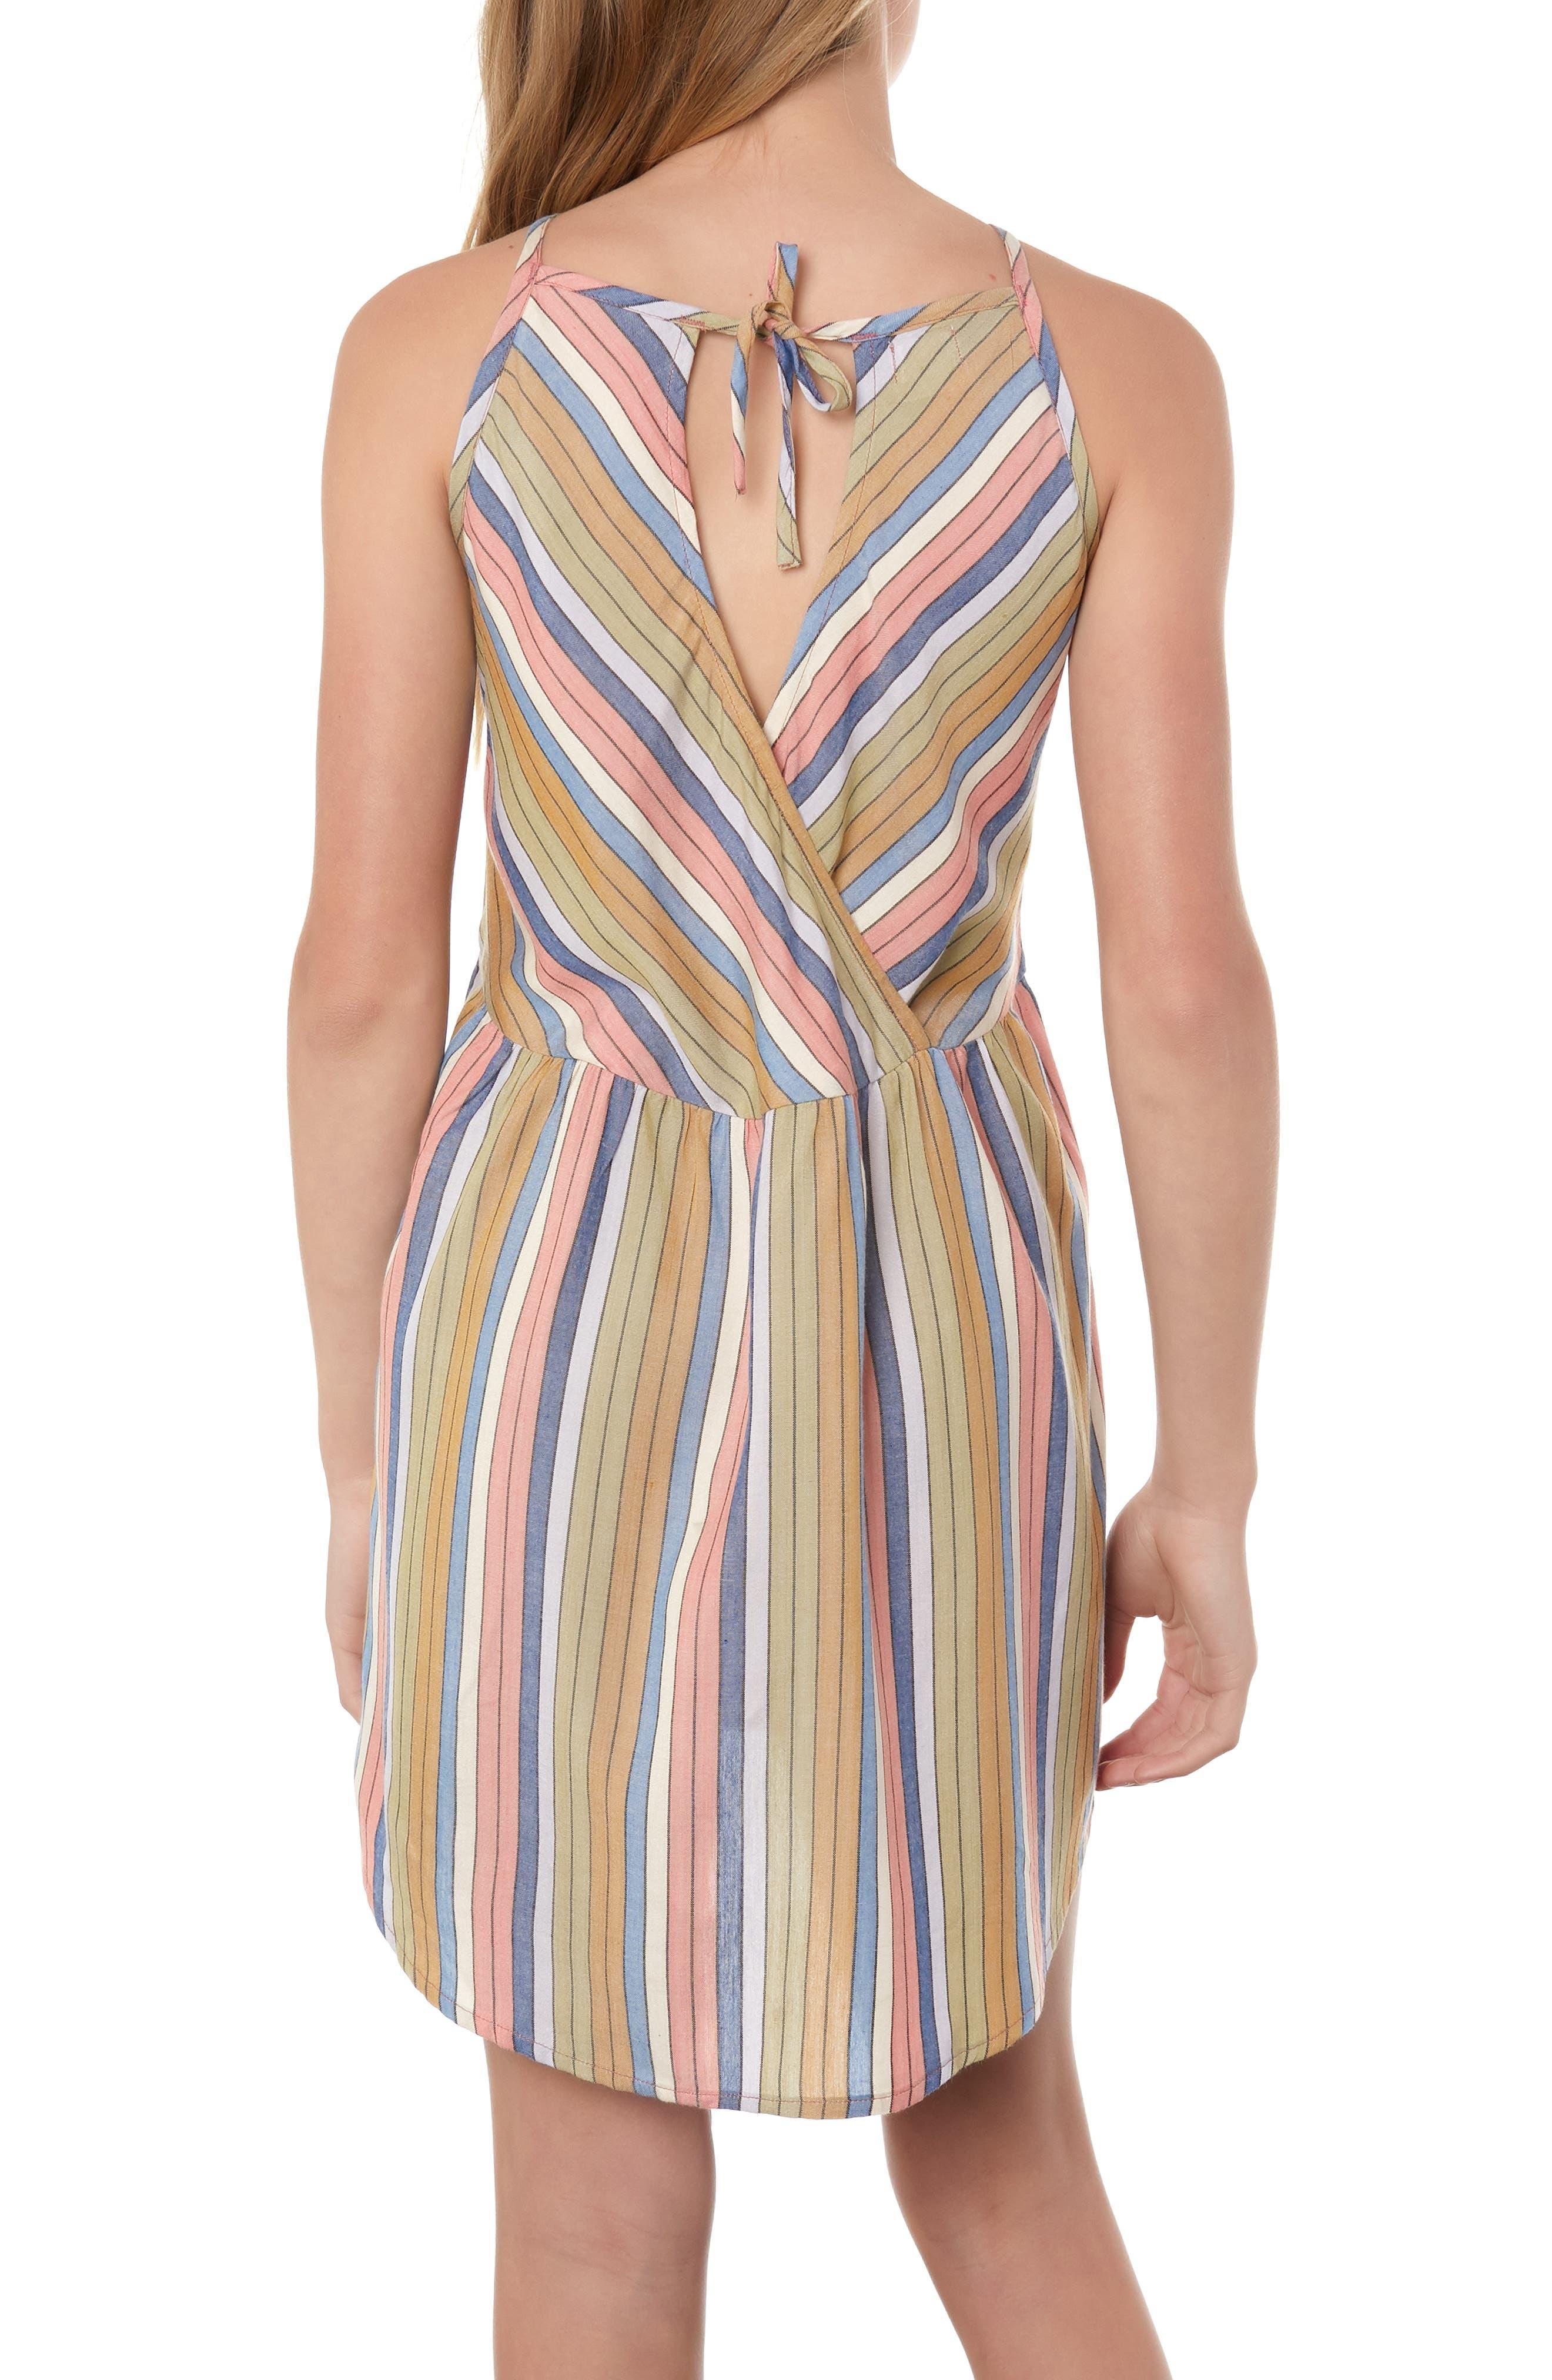 O'NEILL,                             Berlin Stripe Sundress,                             Alternate thumbnail 3, color,                             MULTI COLORED